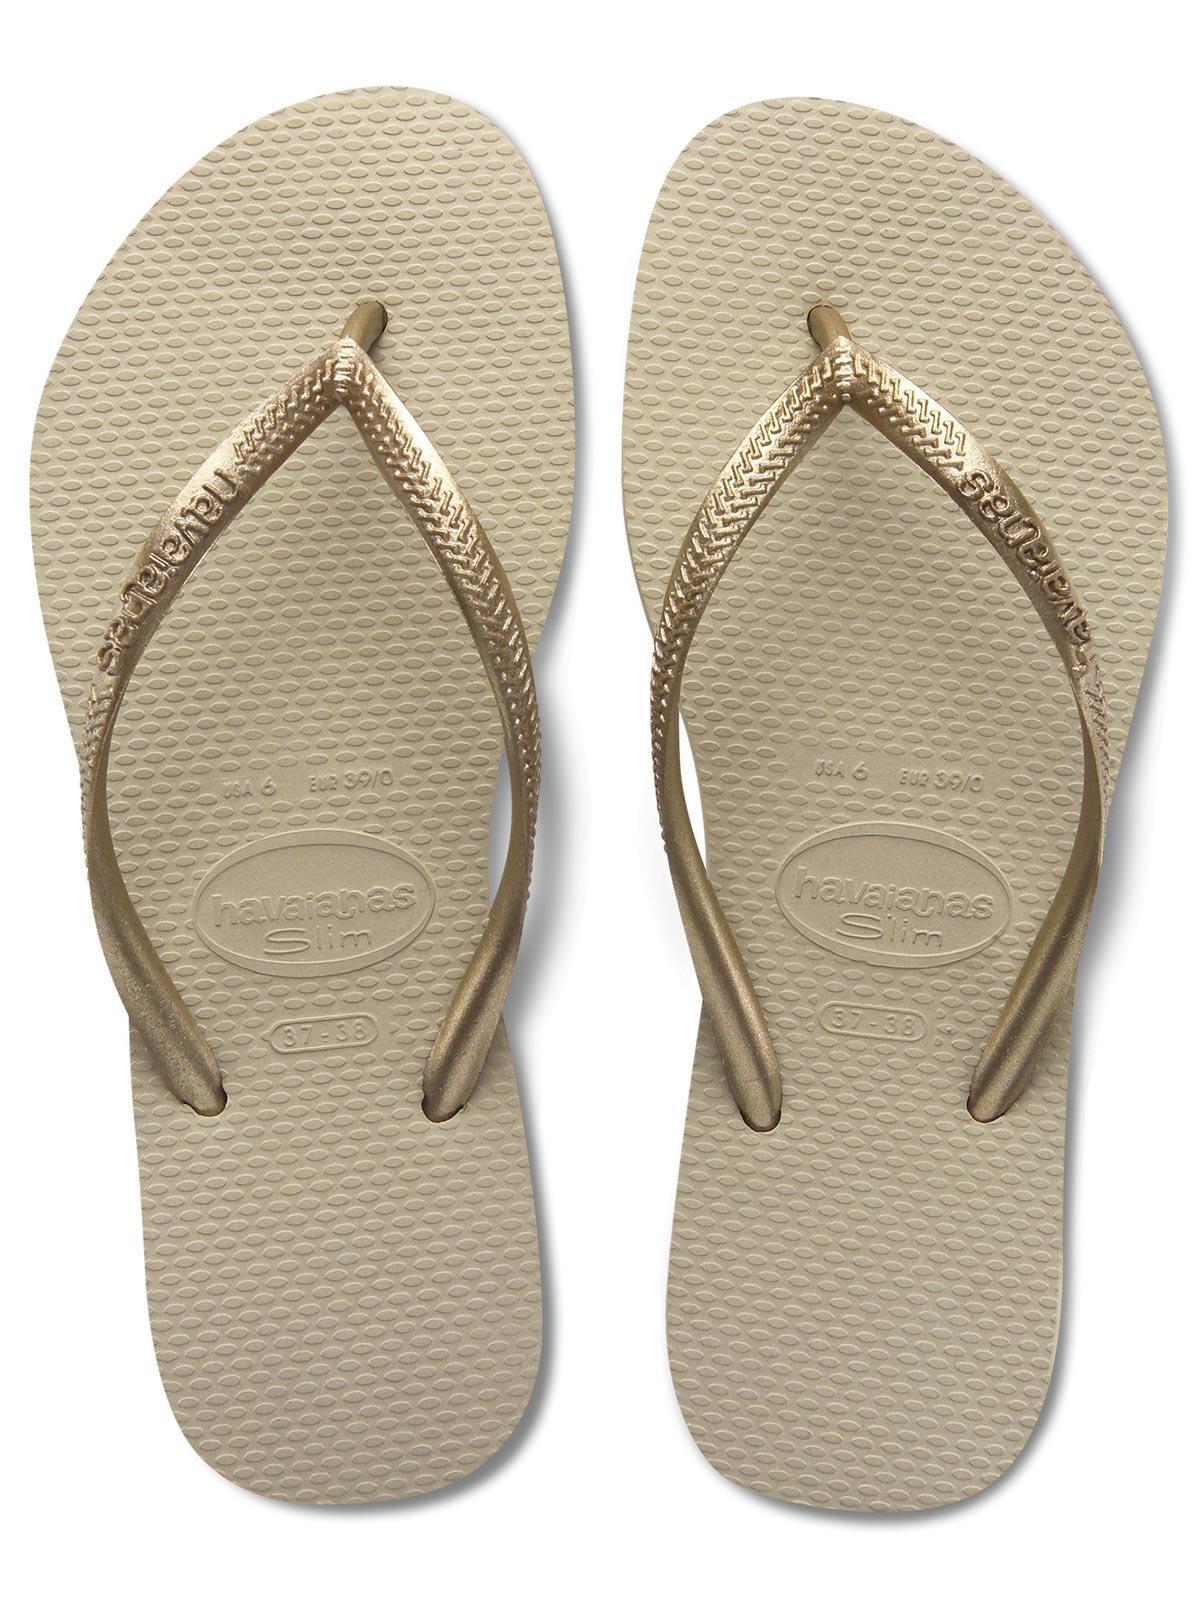 349c145f8895a4 Havaianas Slim Sand Grey   Light Golden